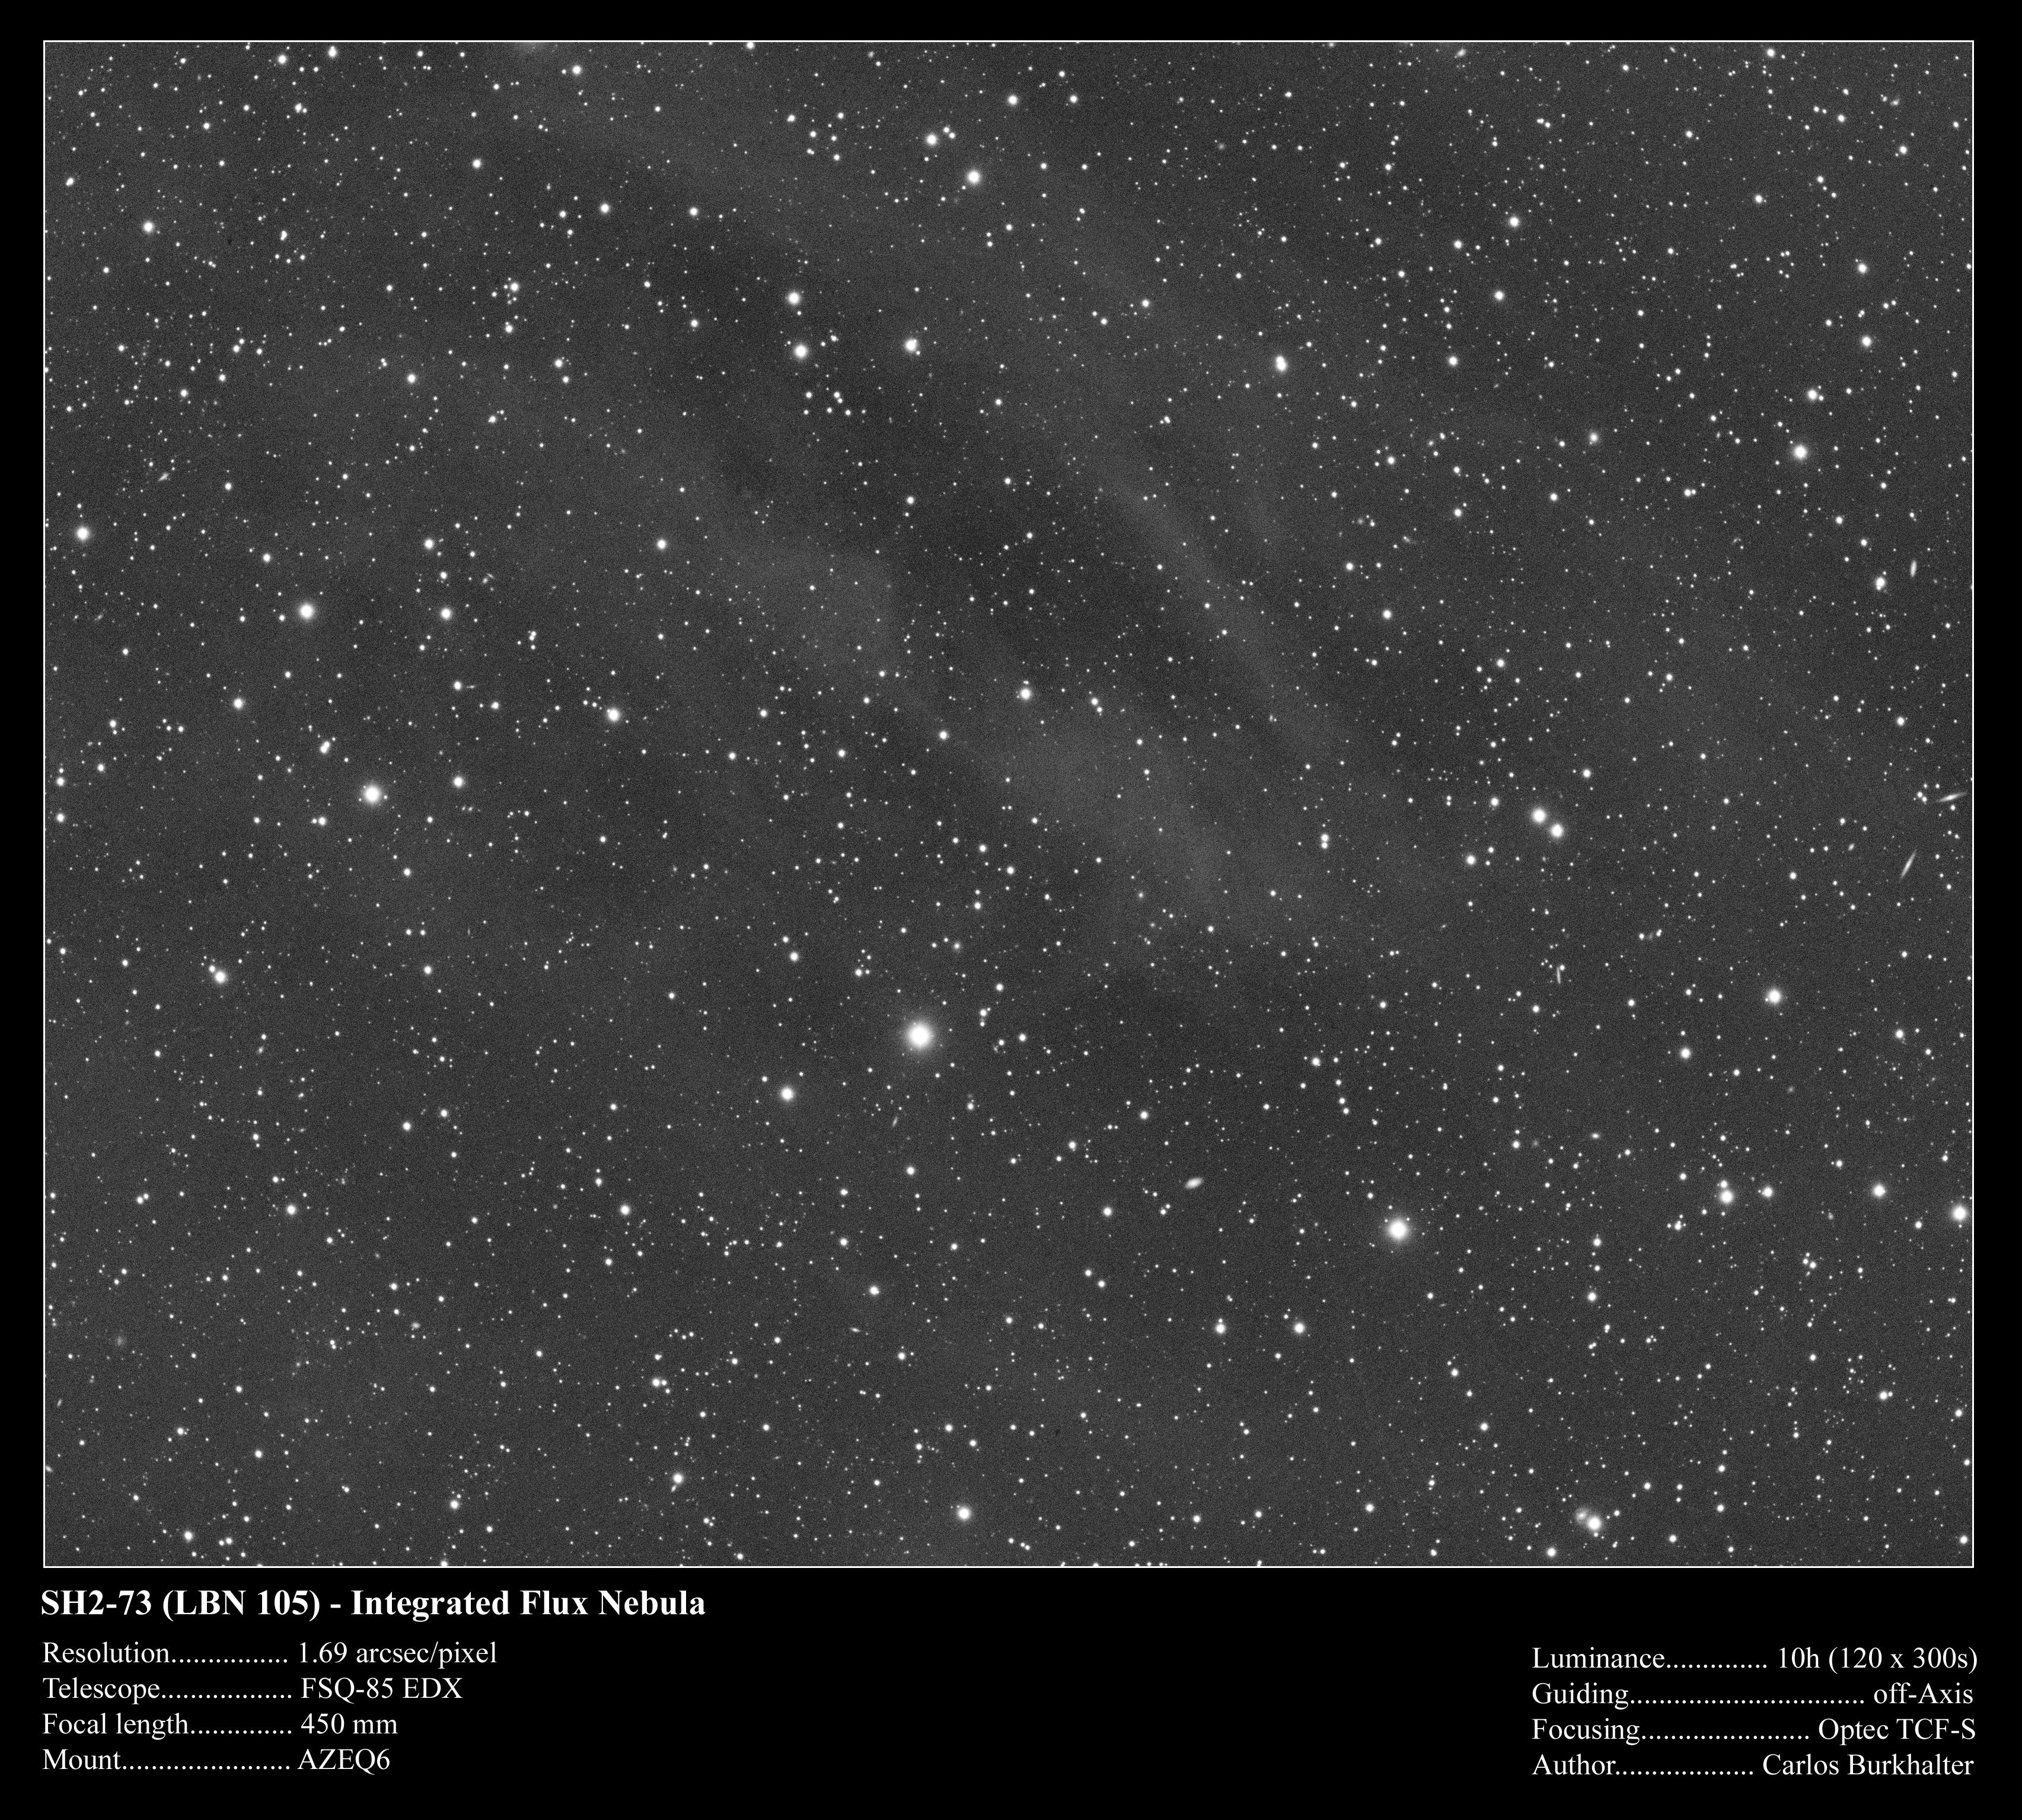 Sh2-73 (LBN105) - Nébuleuse Rare